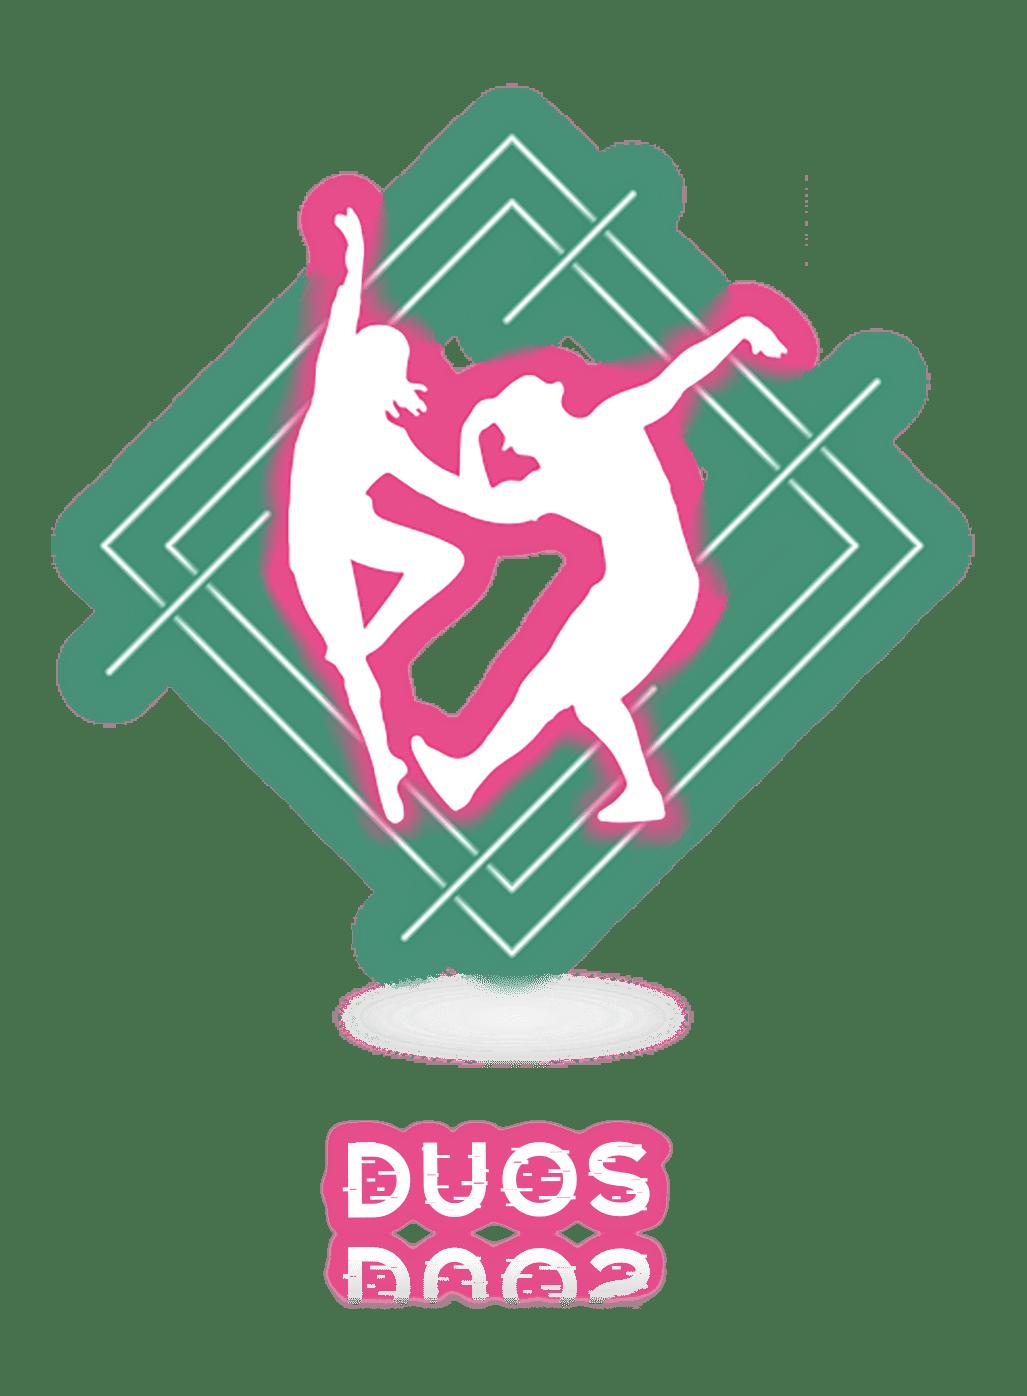 Duos registration